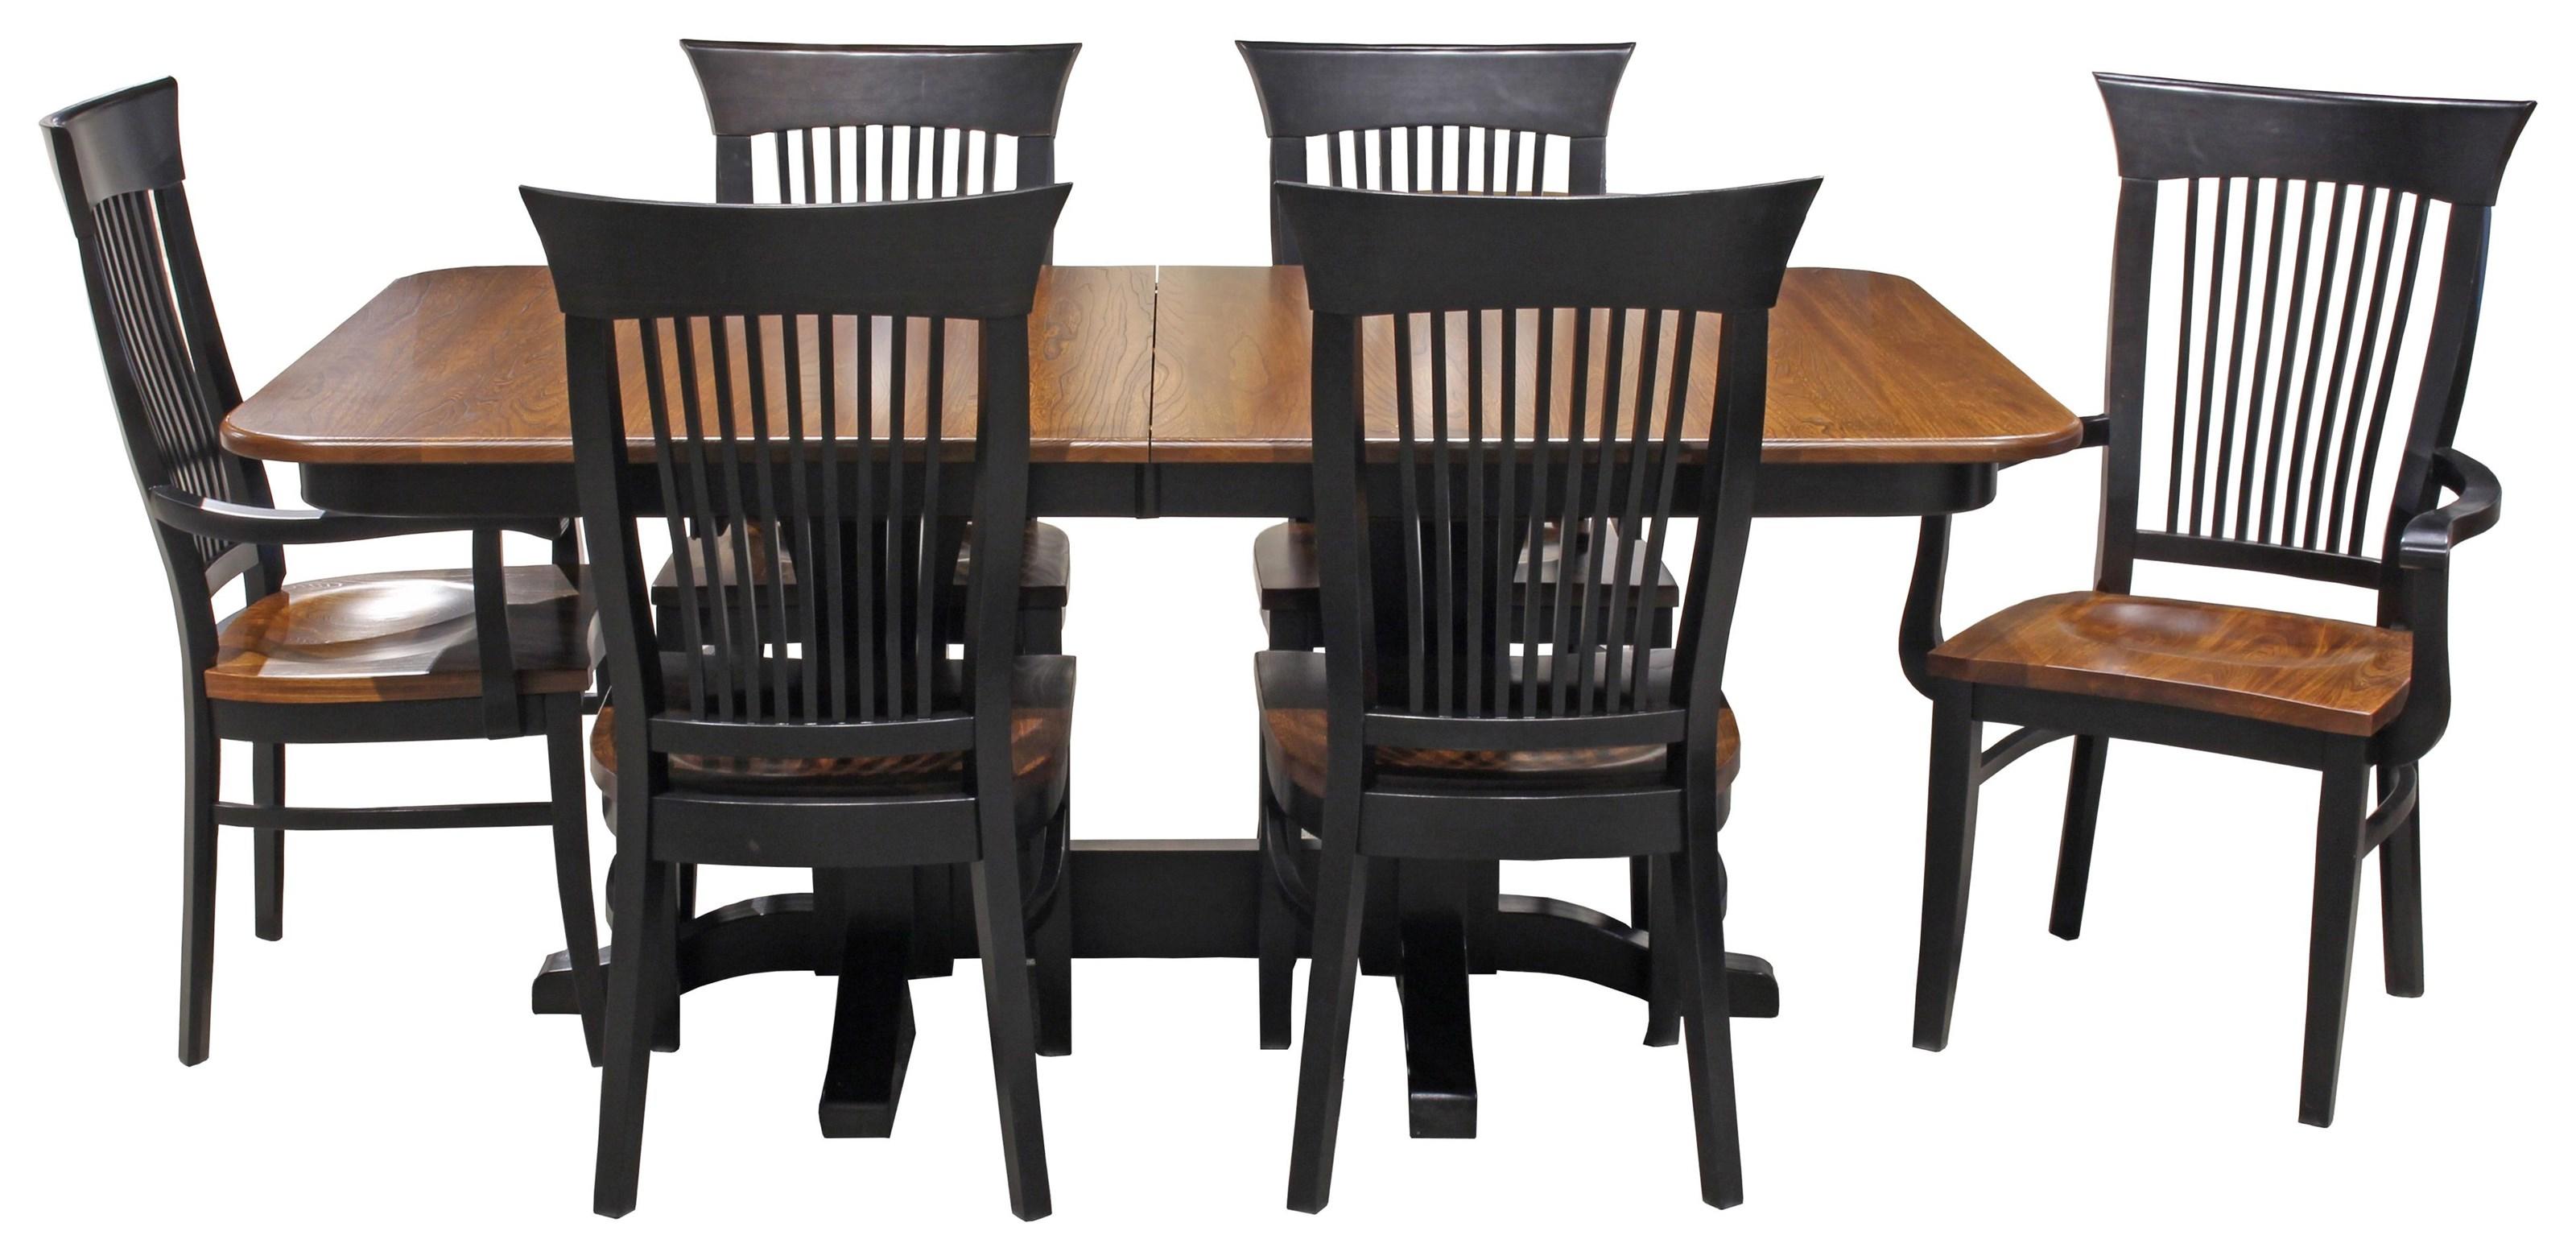 Farmhaus Amish Dining Table by Daniel's Amish at Ruby Gordon Home